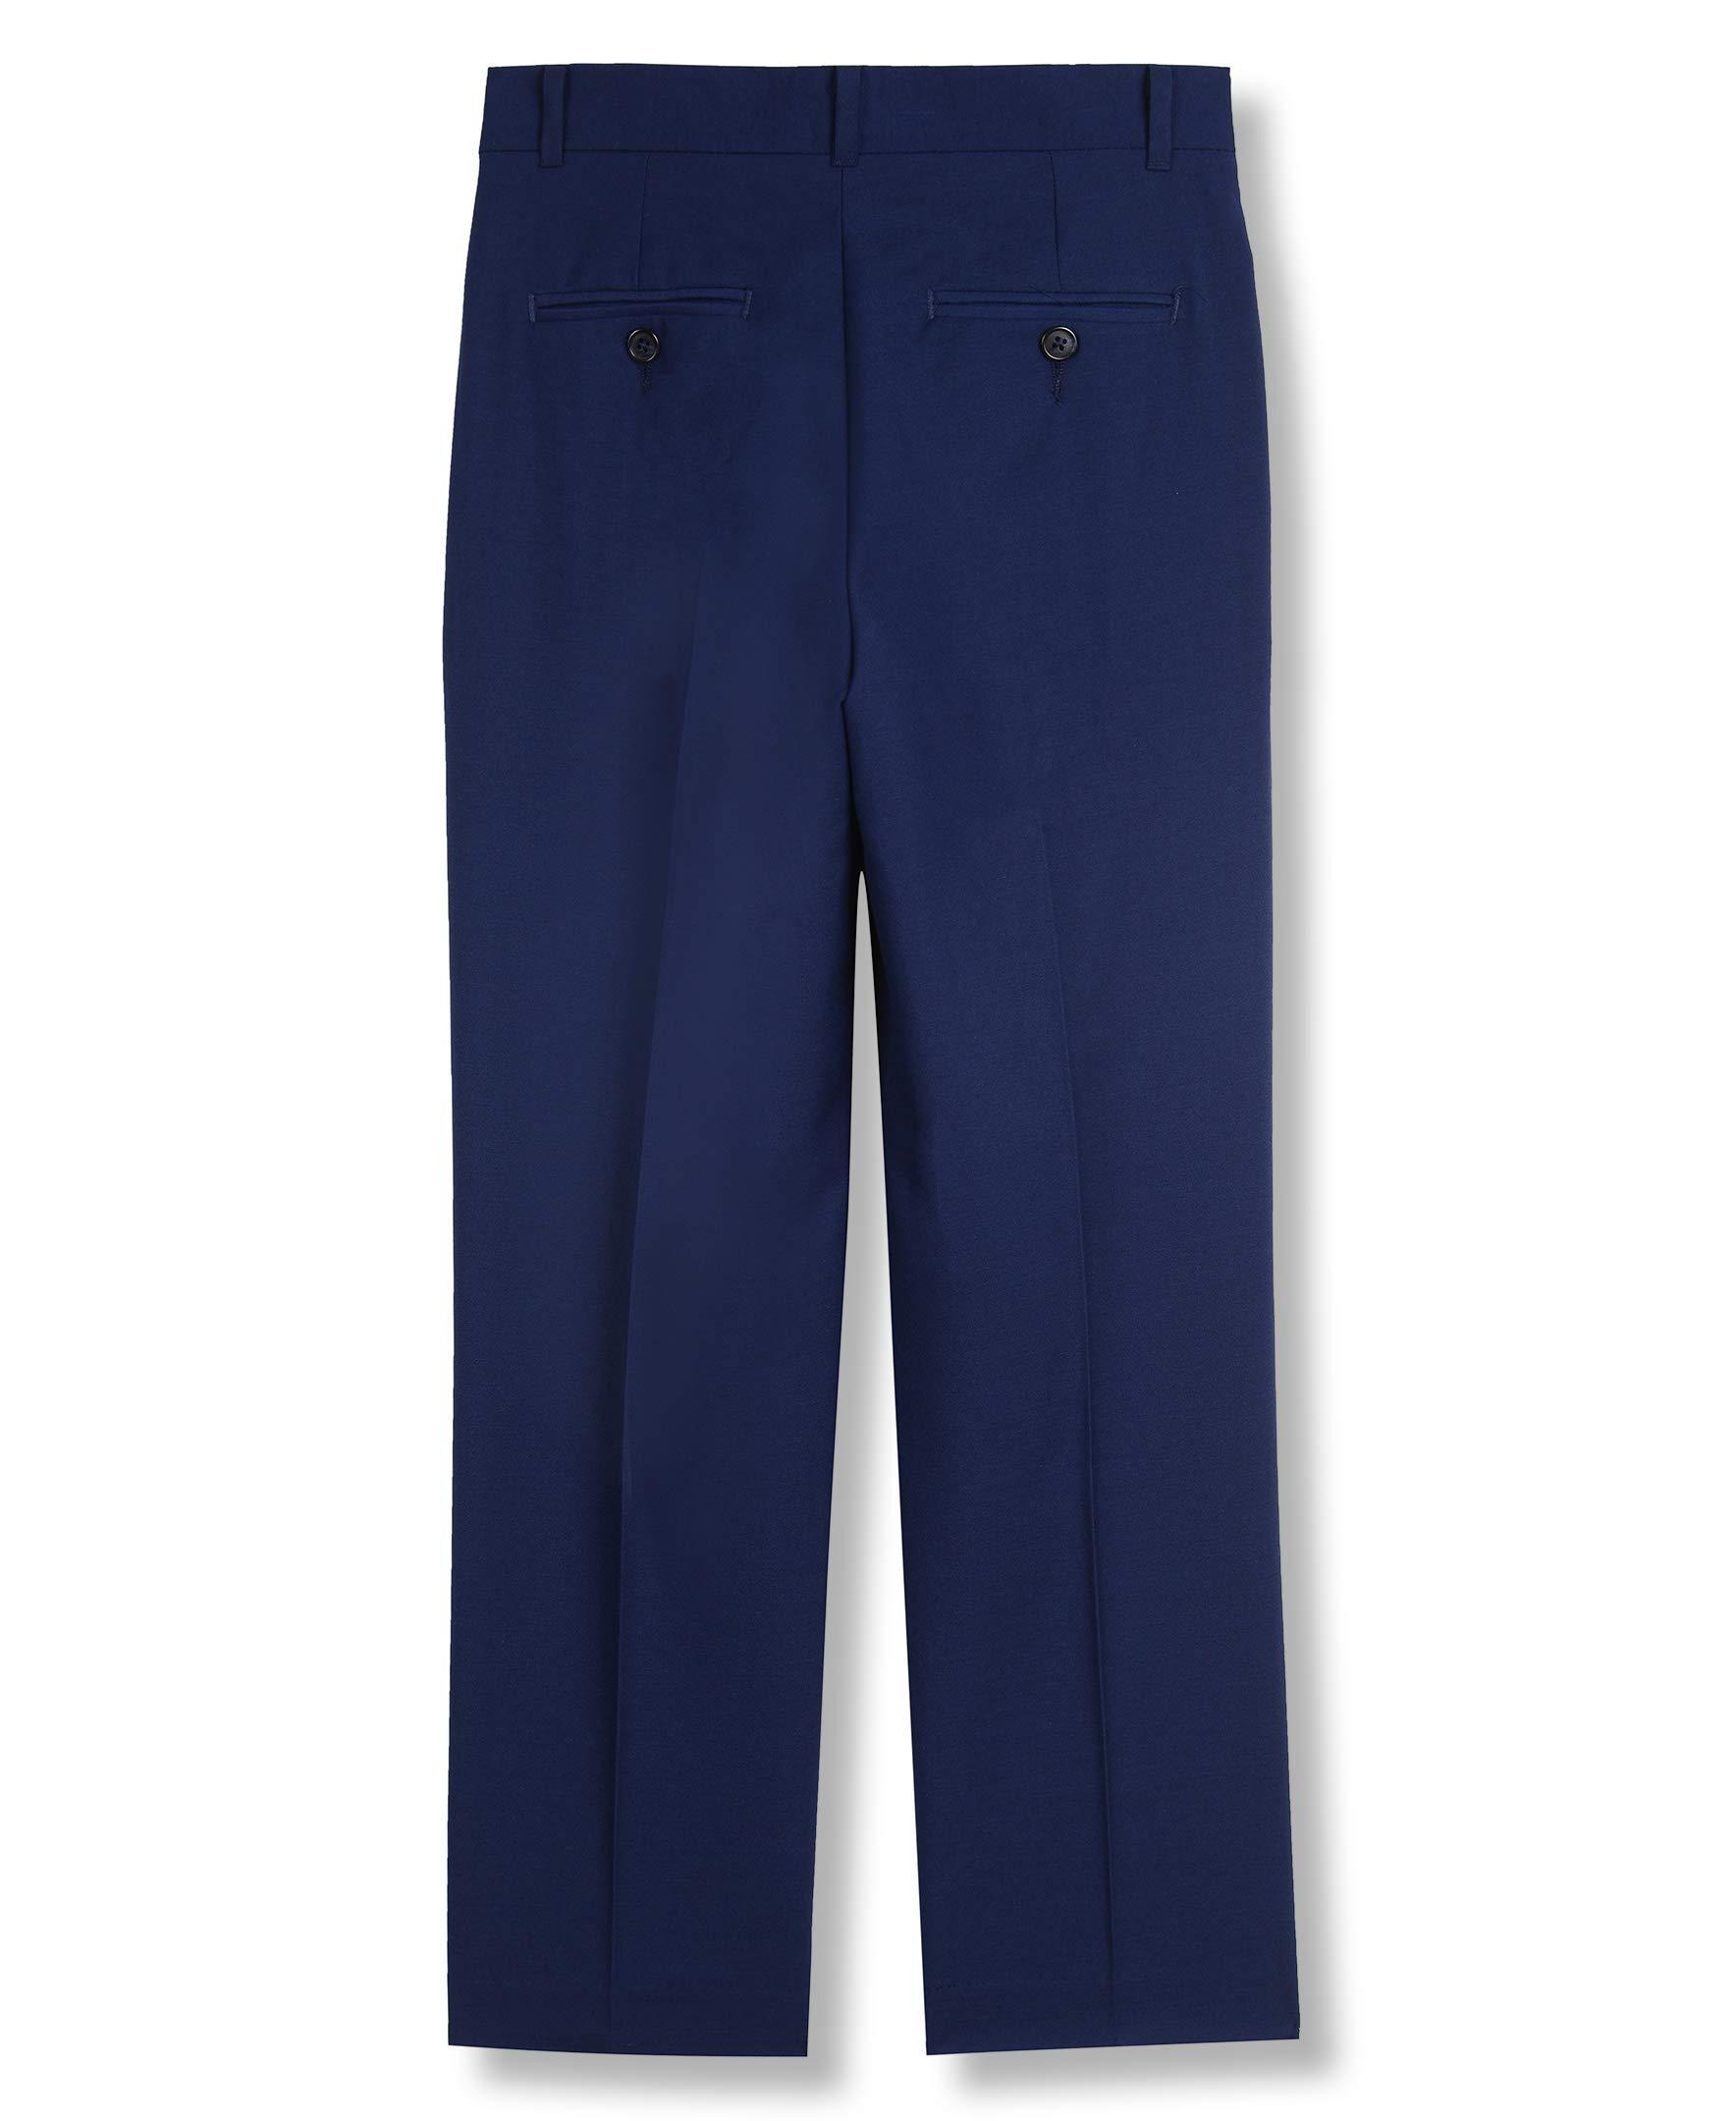 Calvin Klein Big Boys' Flat Front Dress Pant, Infinite Blue, 10 by Calvin Klein (Image #3)